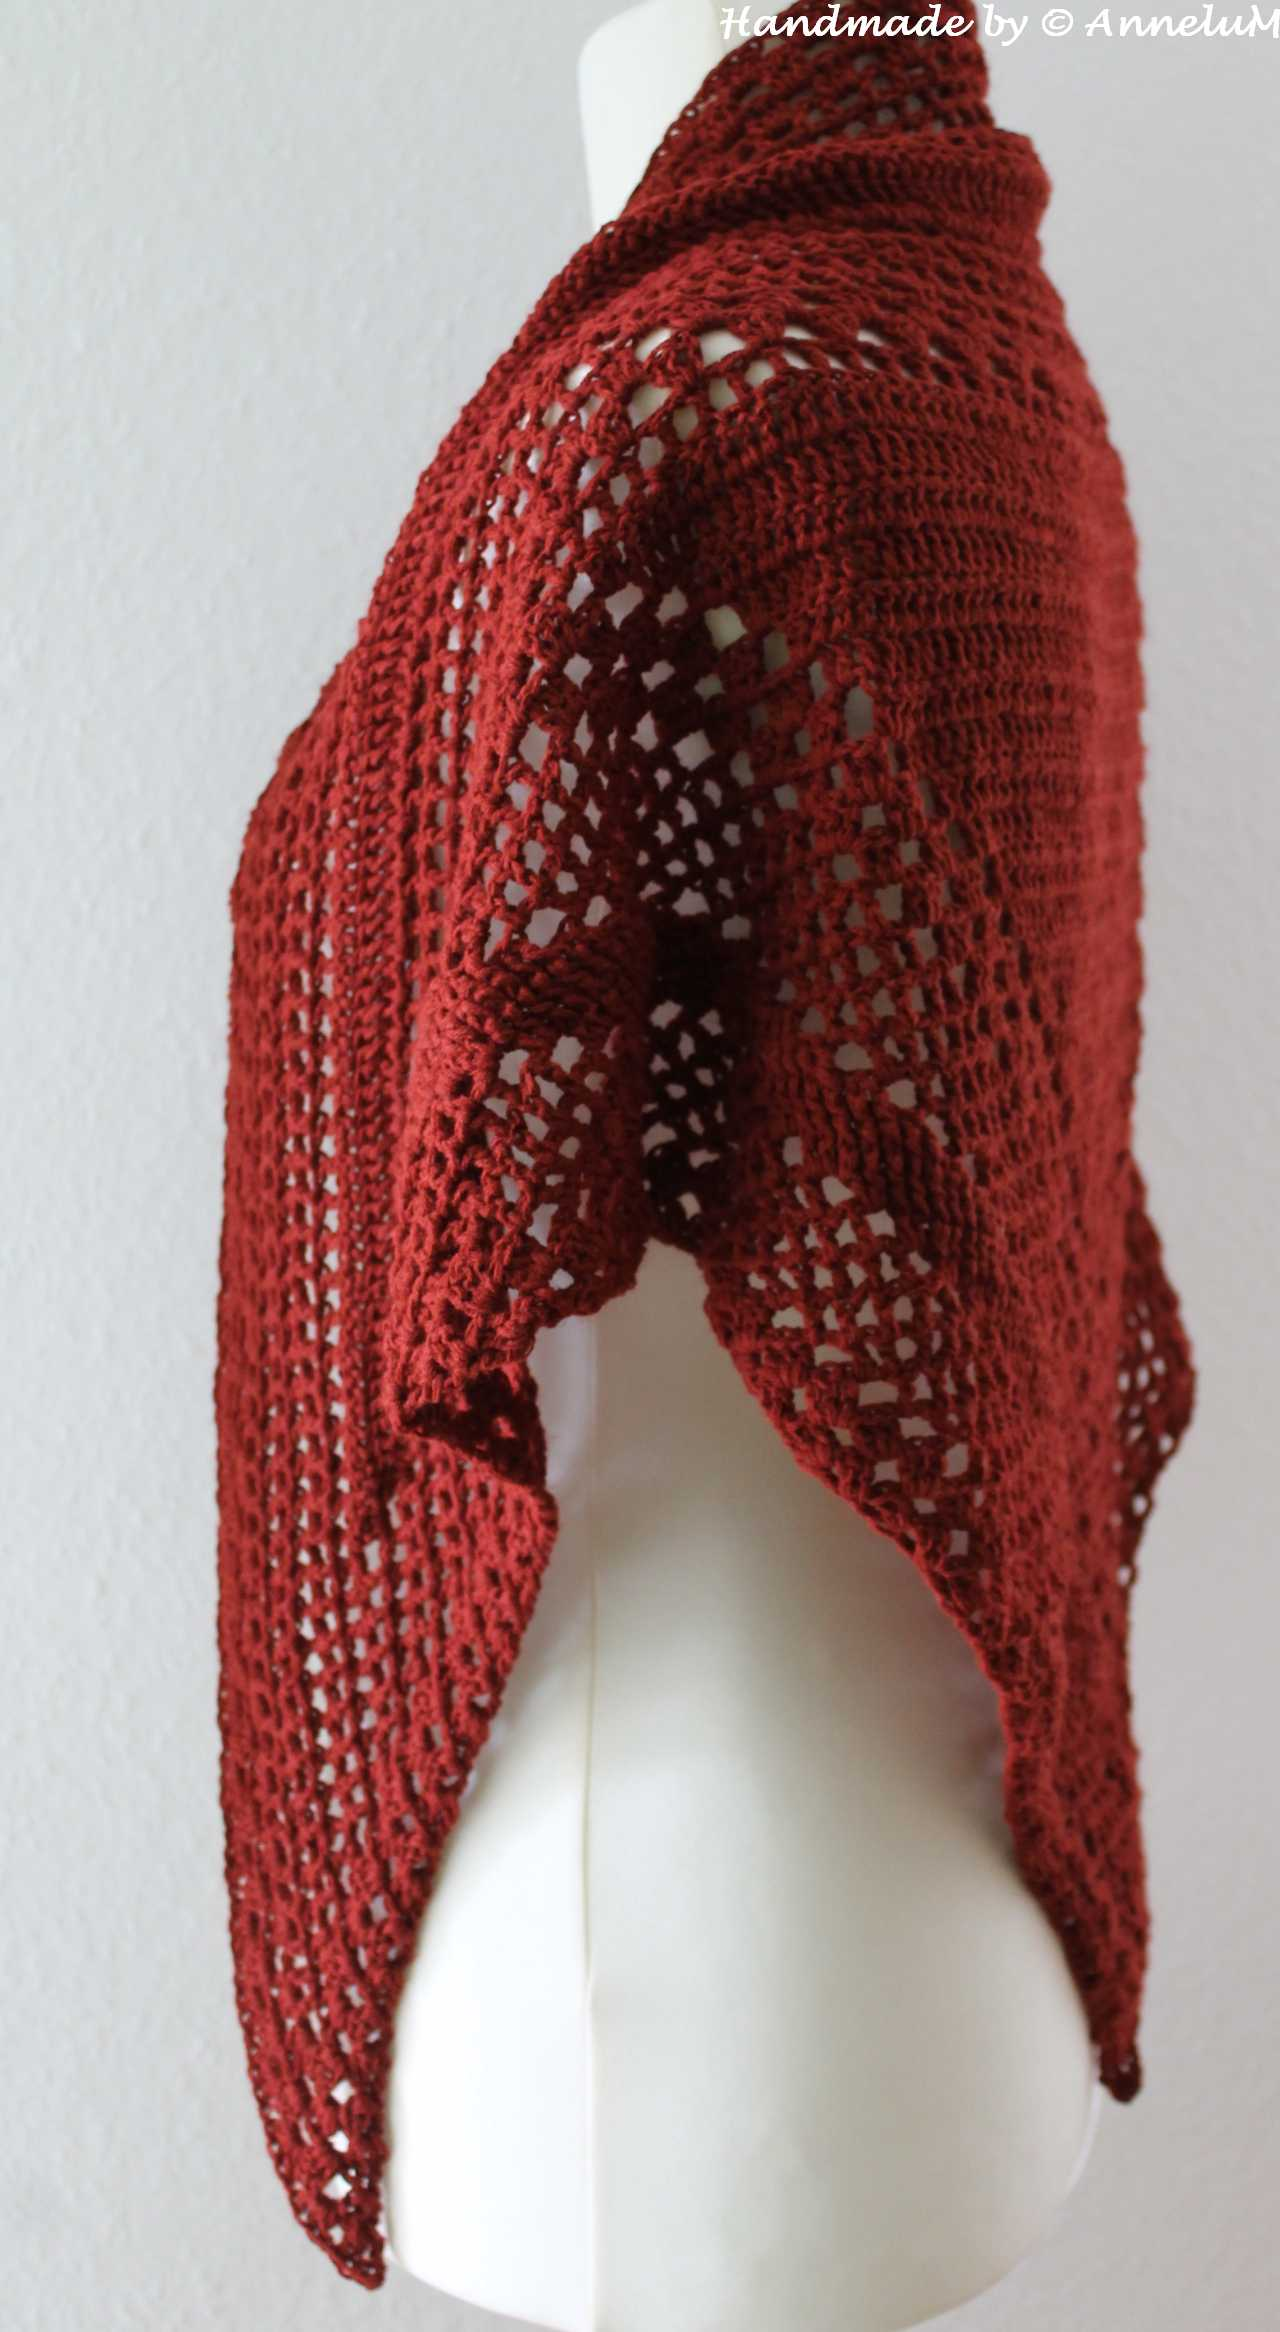 Kolmiot - Handmade by AnneluM